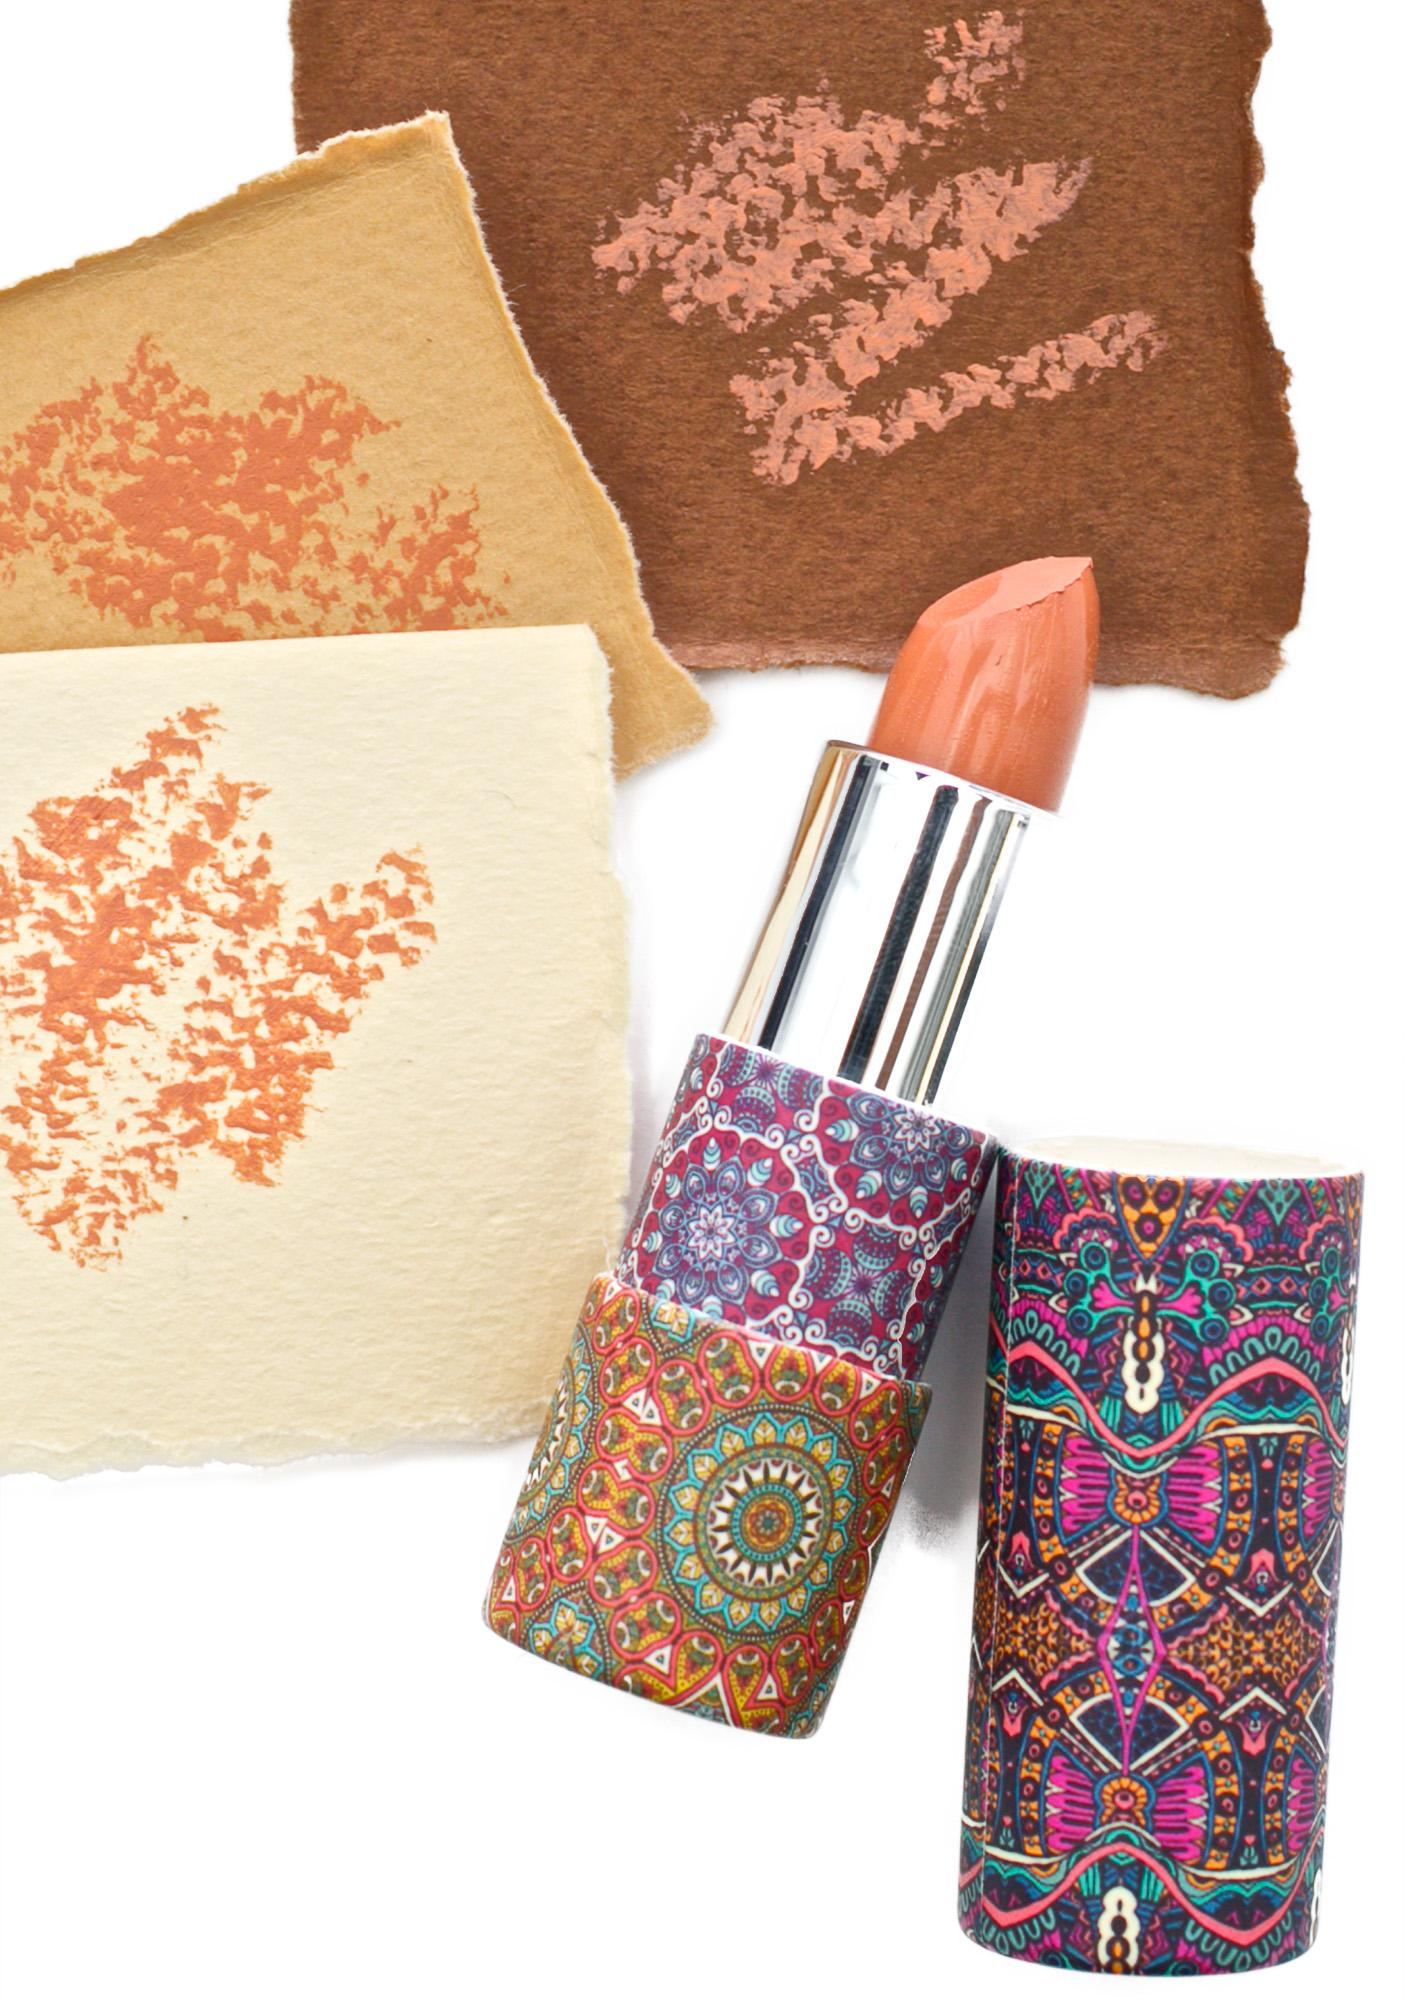 Moonchild Lipstick Tamed Lipstick